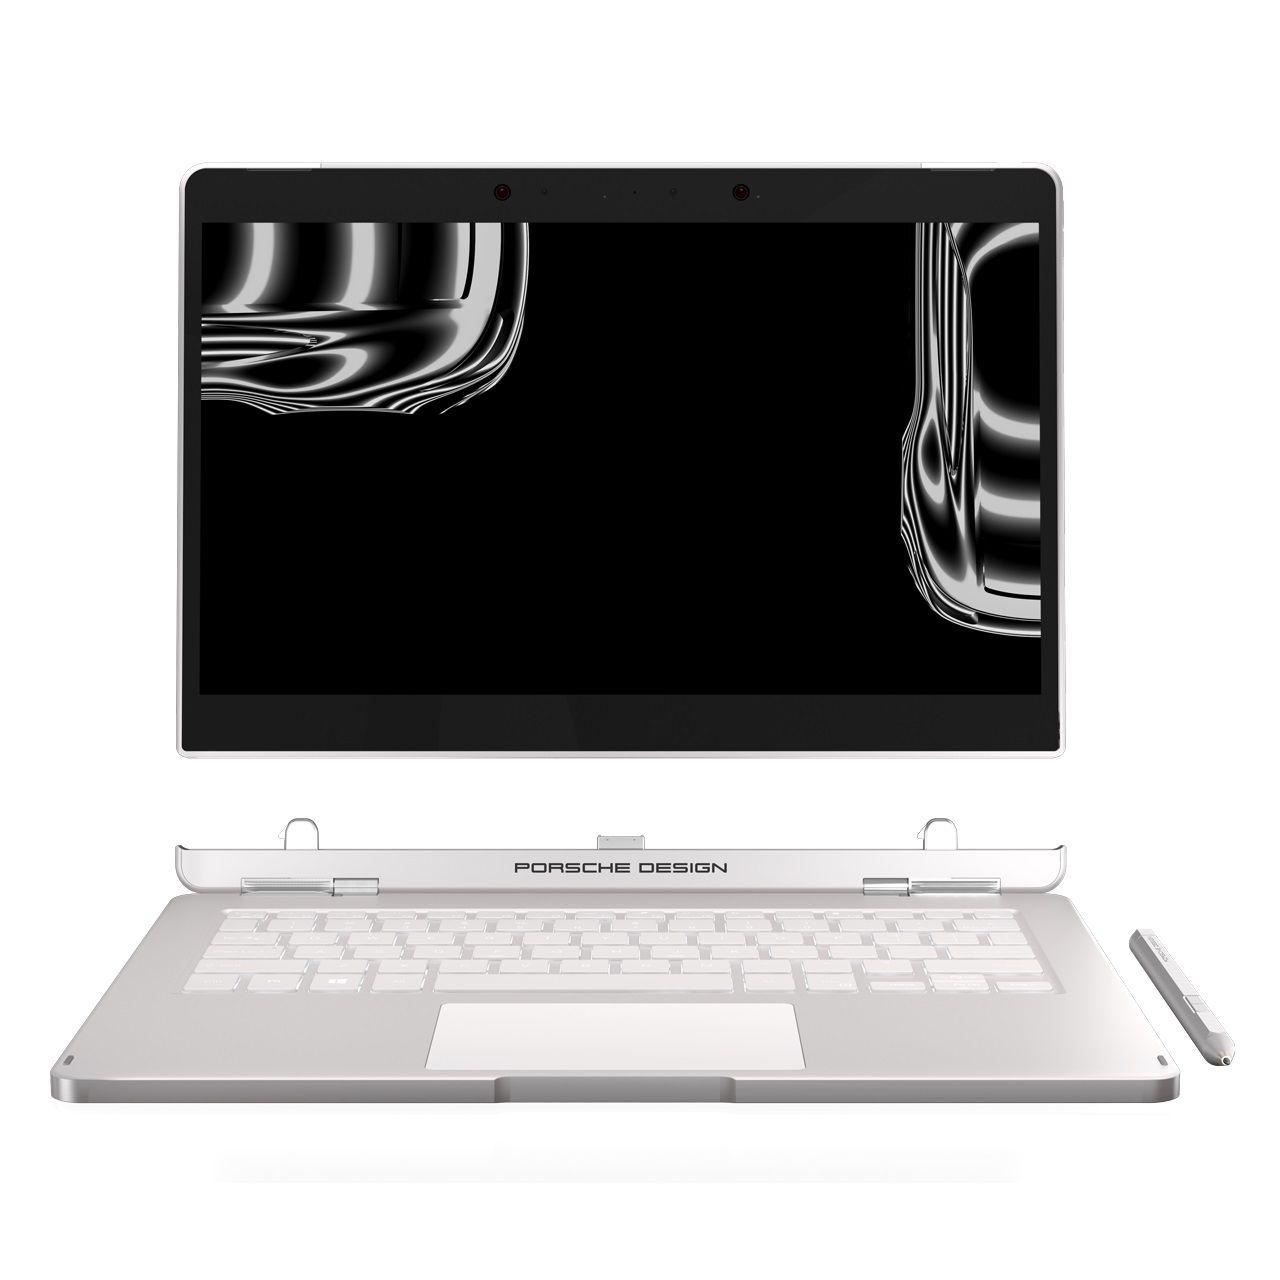 لپ تاپ ۱۳.۳ اینچی پورش دیزاین مدل BOOK ONE